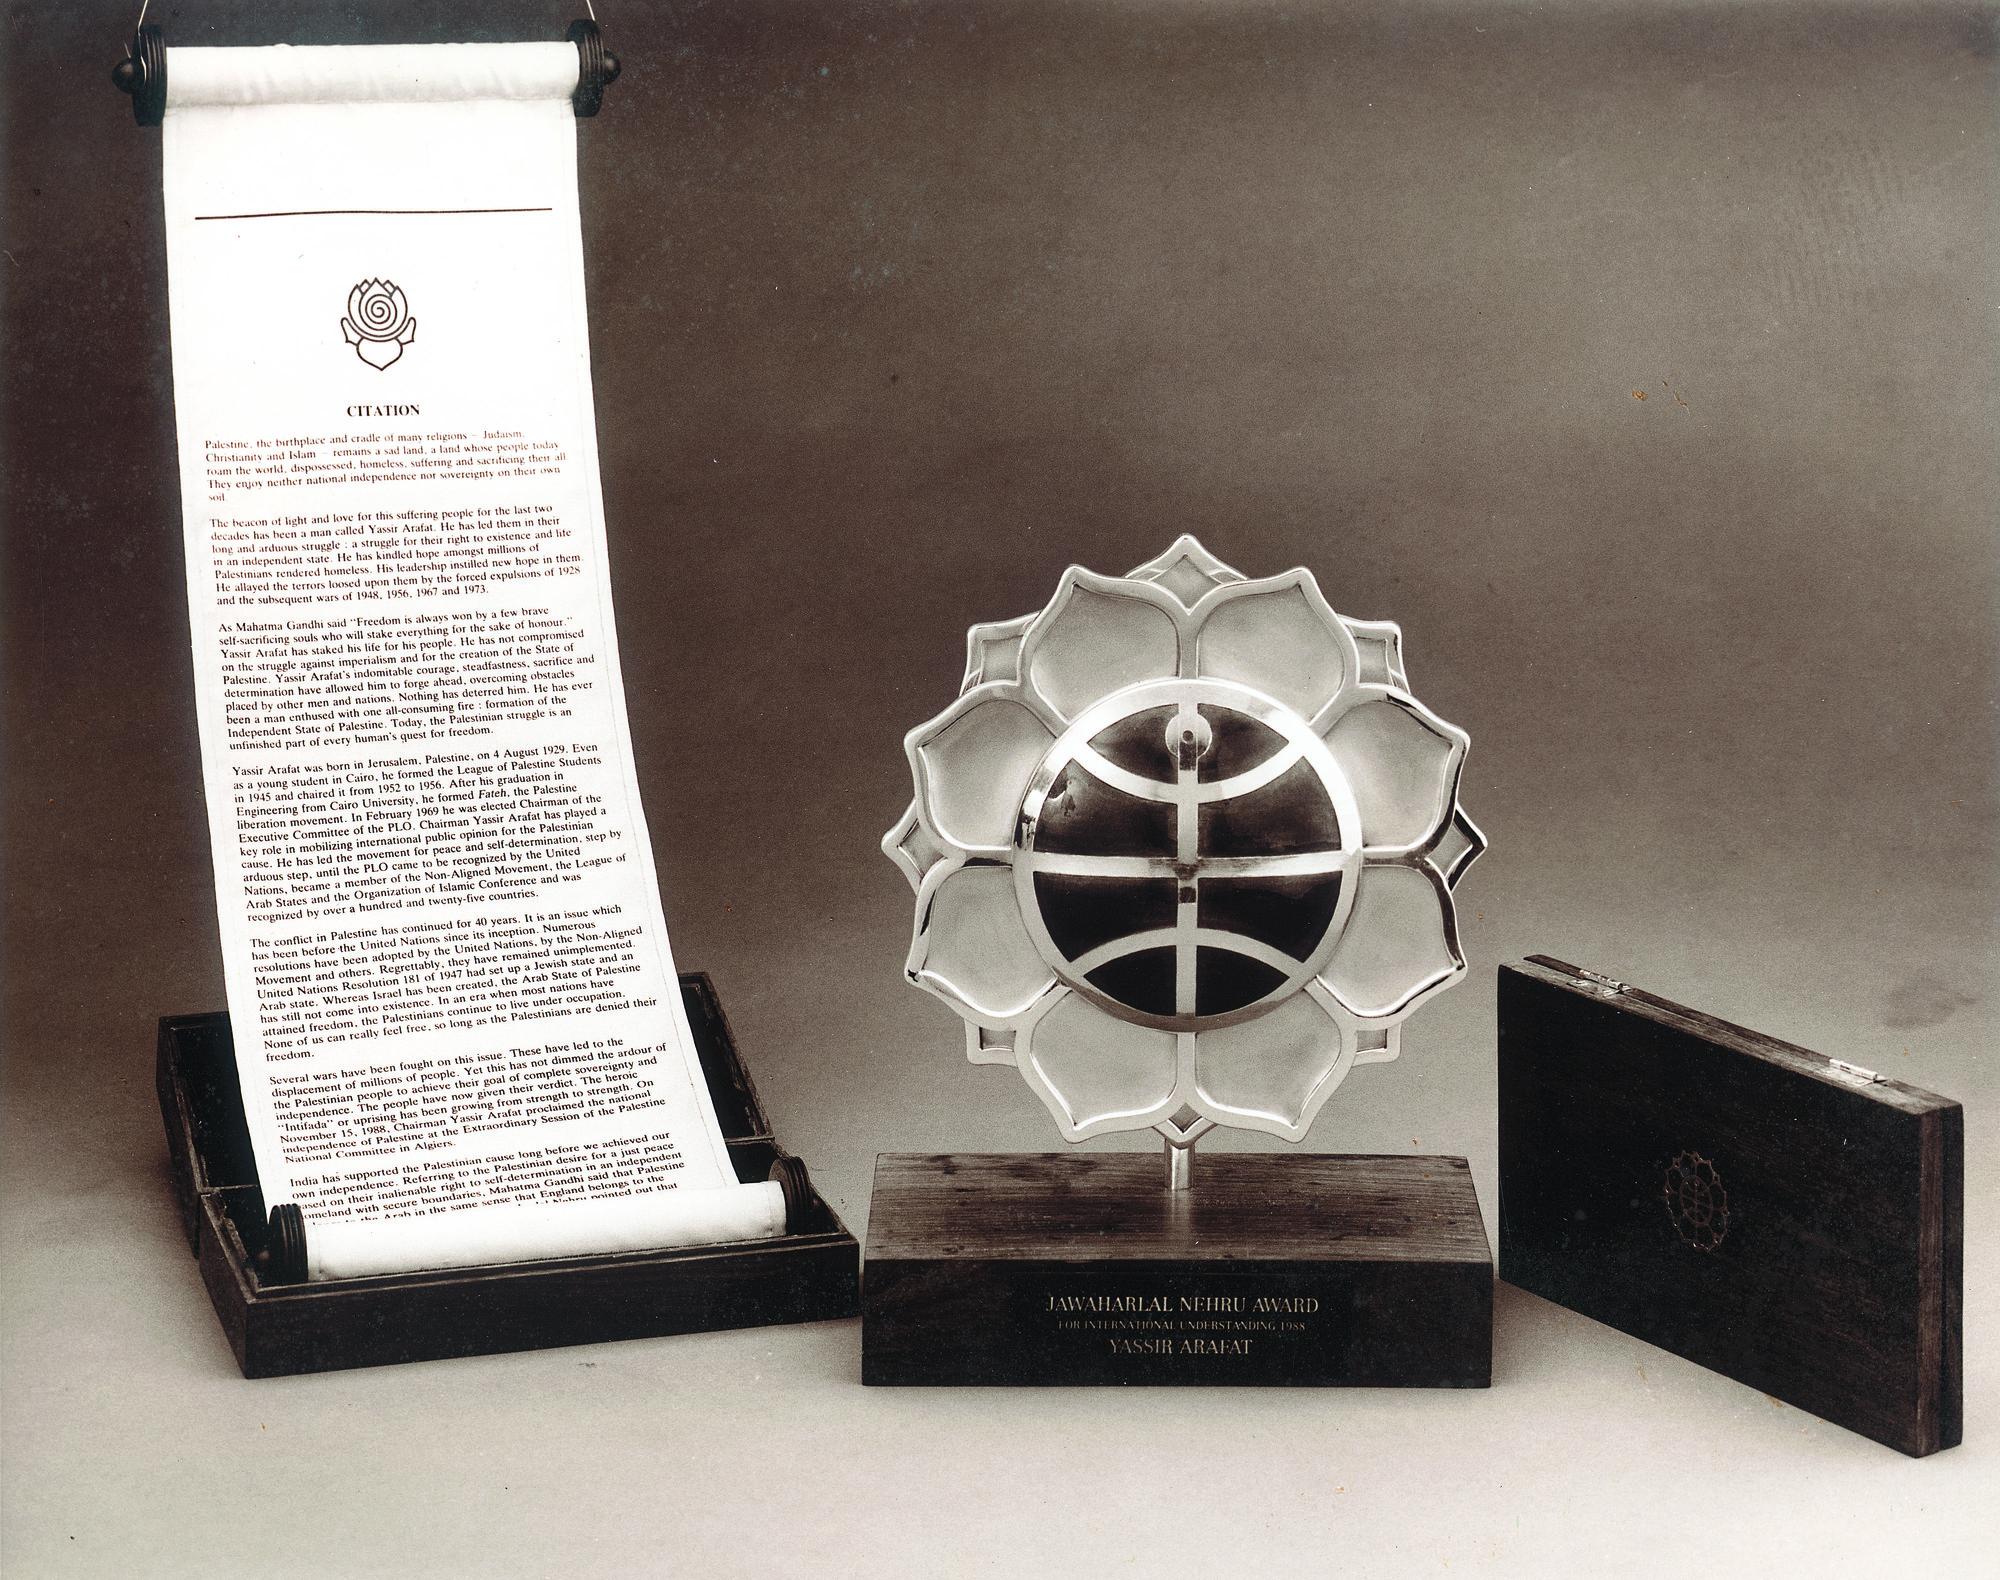 The Jawaharlal Nehru Award for International Understanding, designed by Kumar Vyas. Image Courtesy of Kumar Vyas.